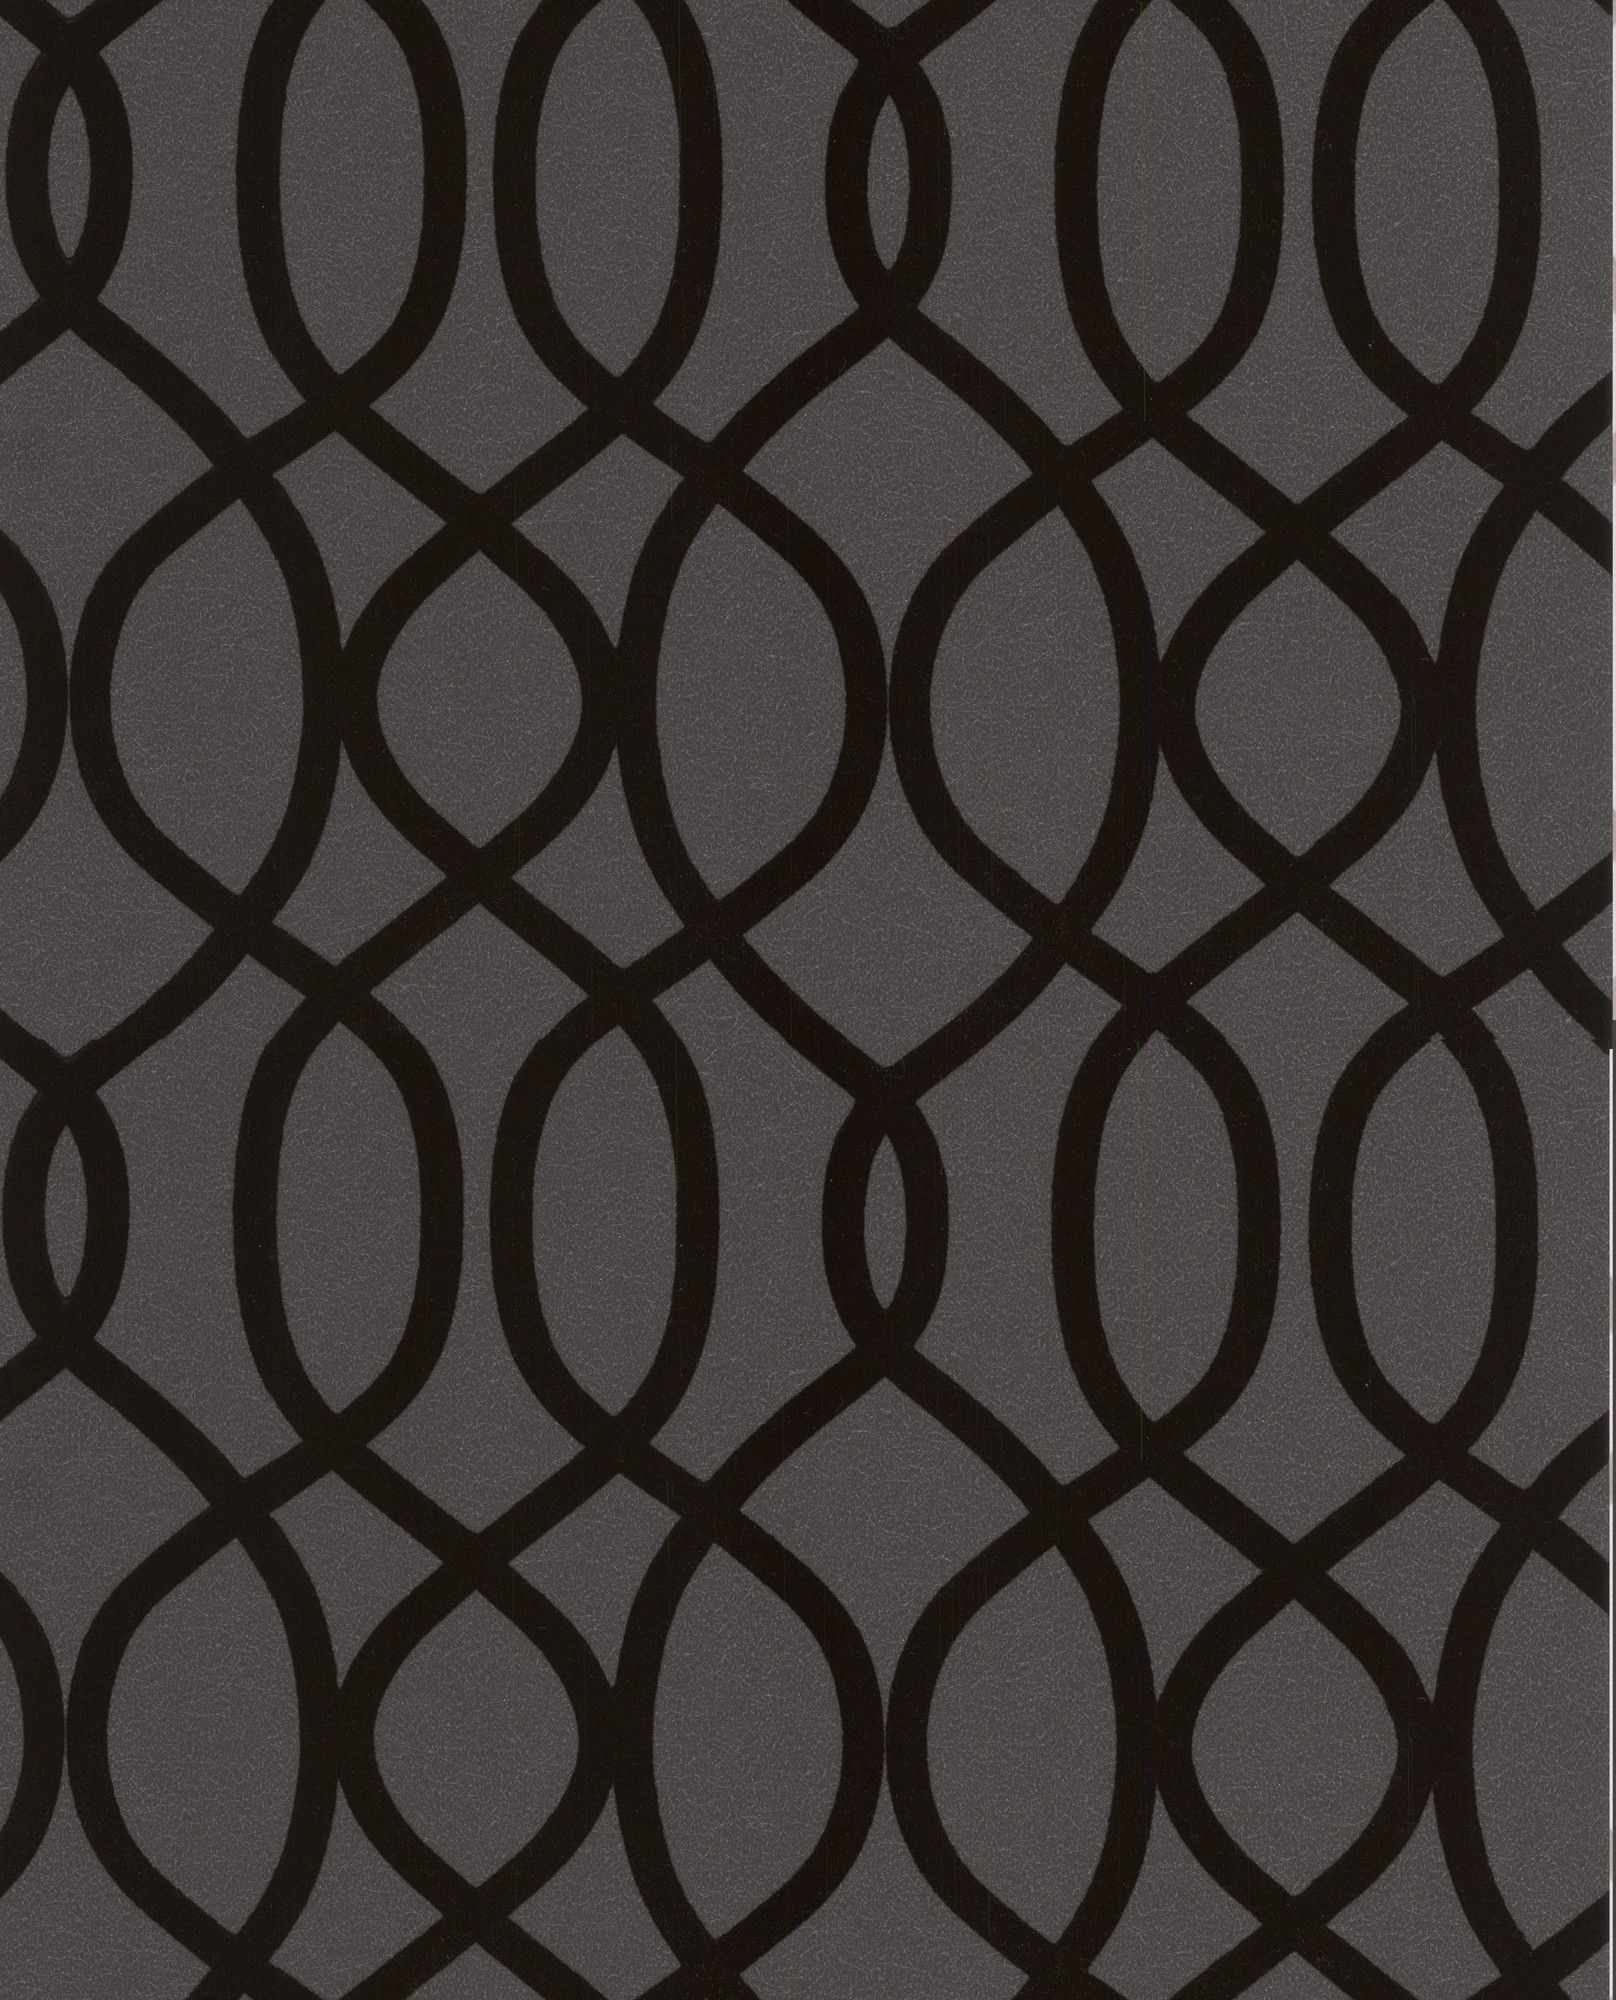 Graham & Brown Kelly Hoppen Style Knightsbridge Flock Wallpaper